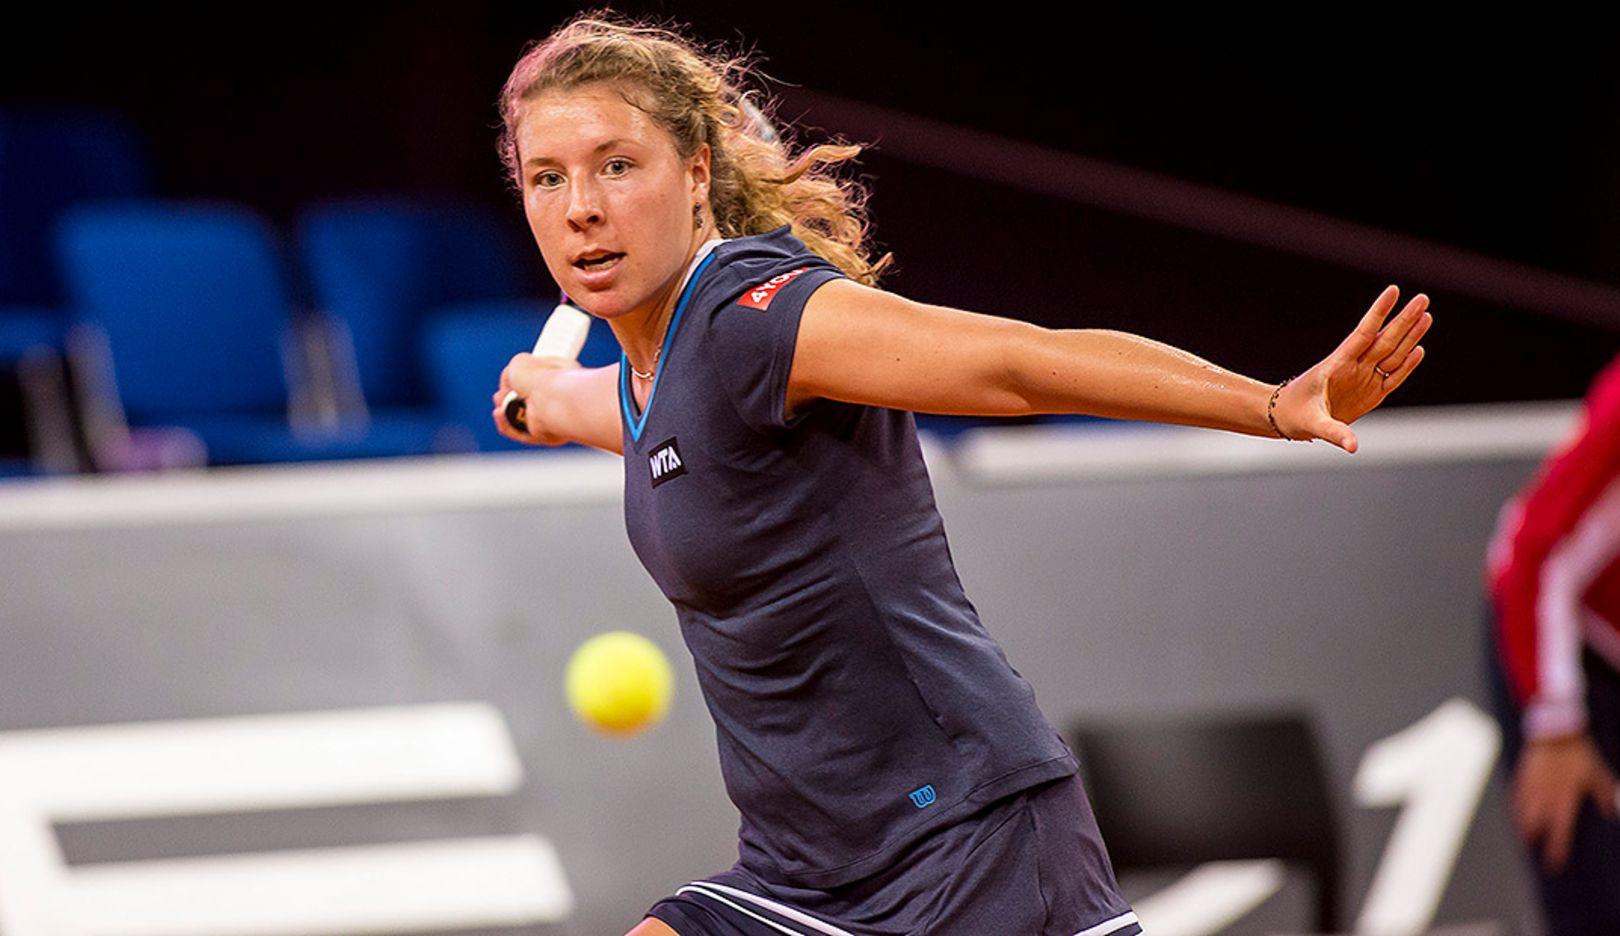 Anna-Lena Friedsam, Tennisspielerin, Porsche Talentteam Deutschland, Porsche Tennis Grand Prix, Porsche-Arena Stuttgart, 2014, Porsche AG